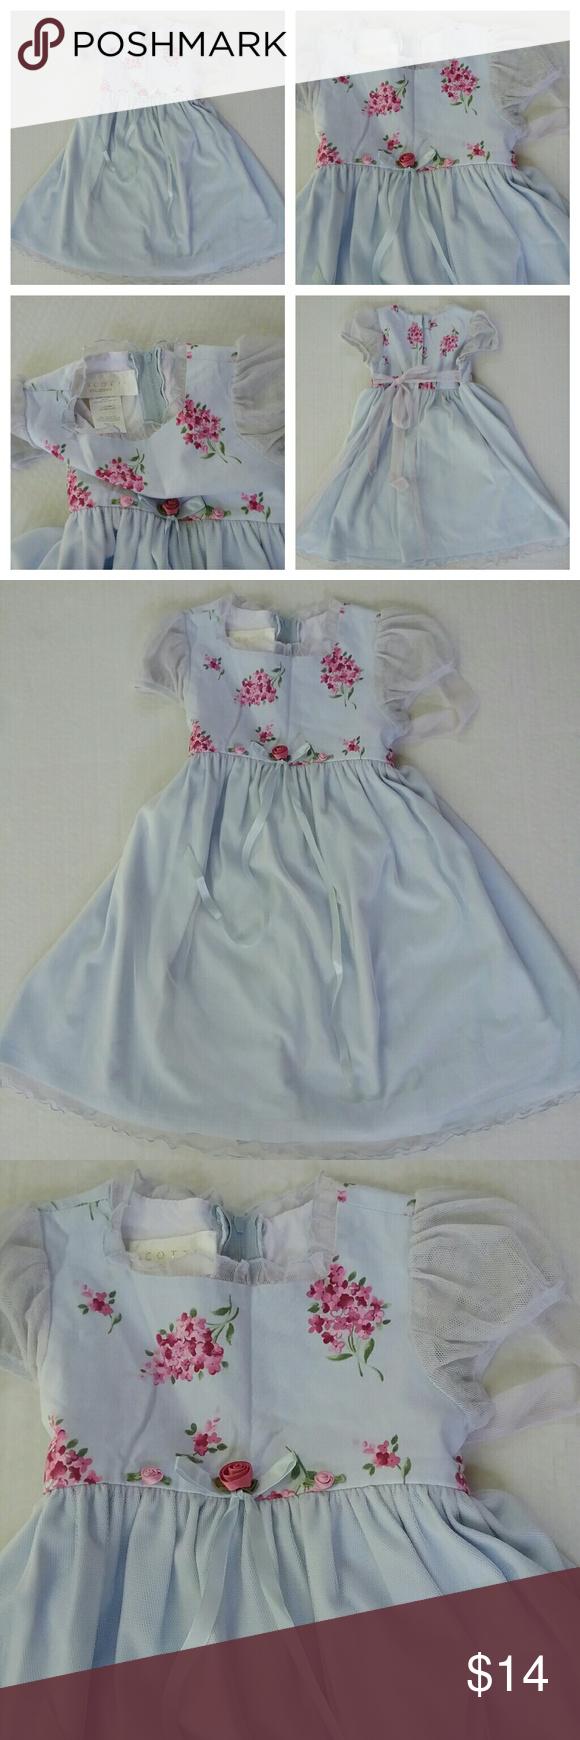 Biscotti Collezion Girls 4T Dressy Dress Blue Rose | Stains, Dress ...